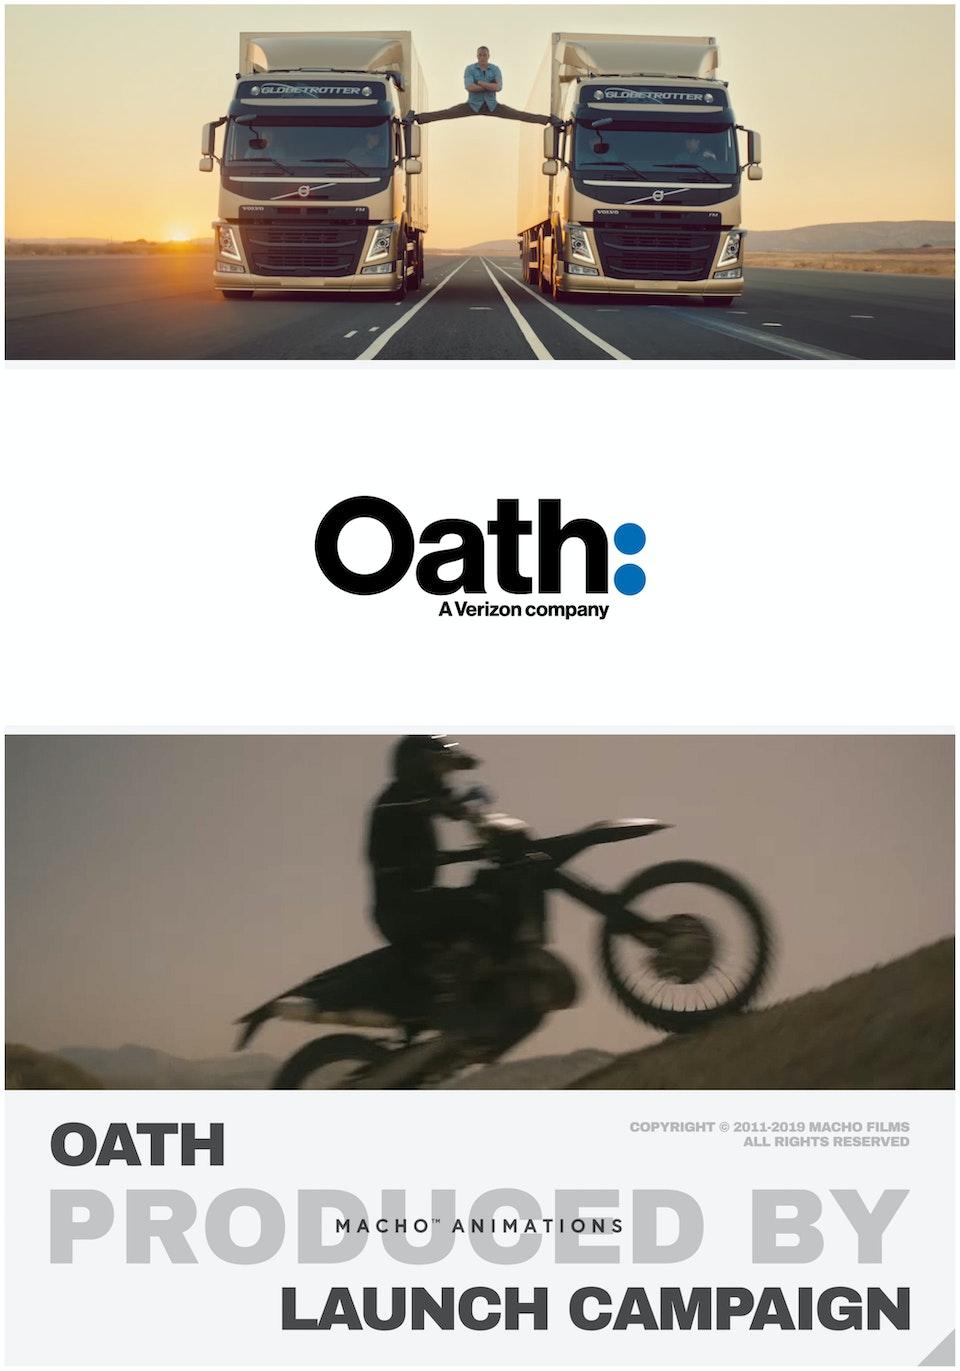 M A C H O - Oath // 2018 Launch Campaign